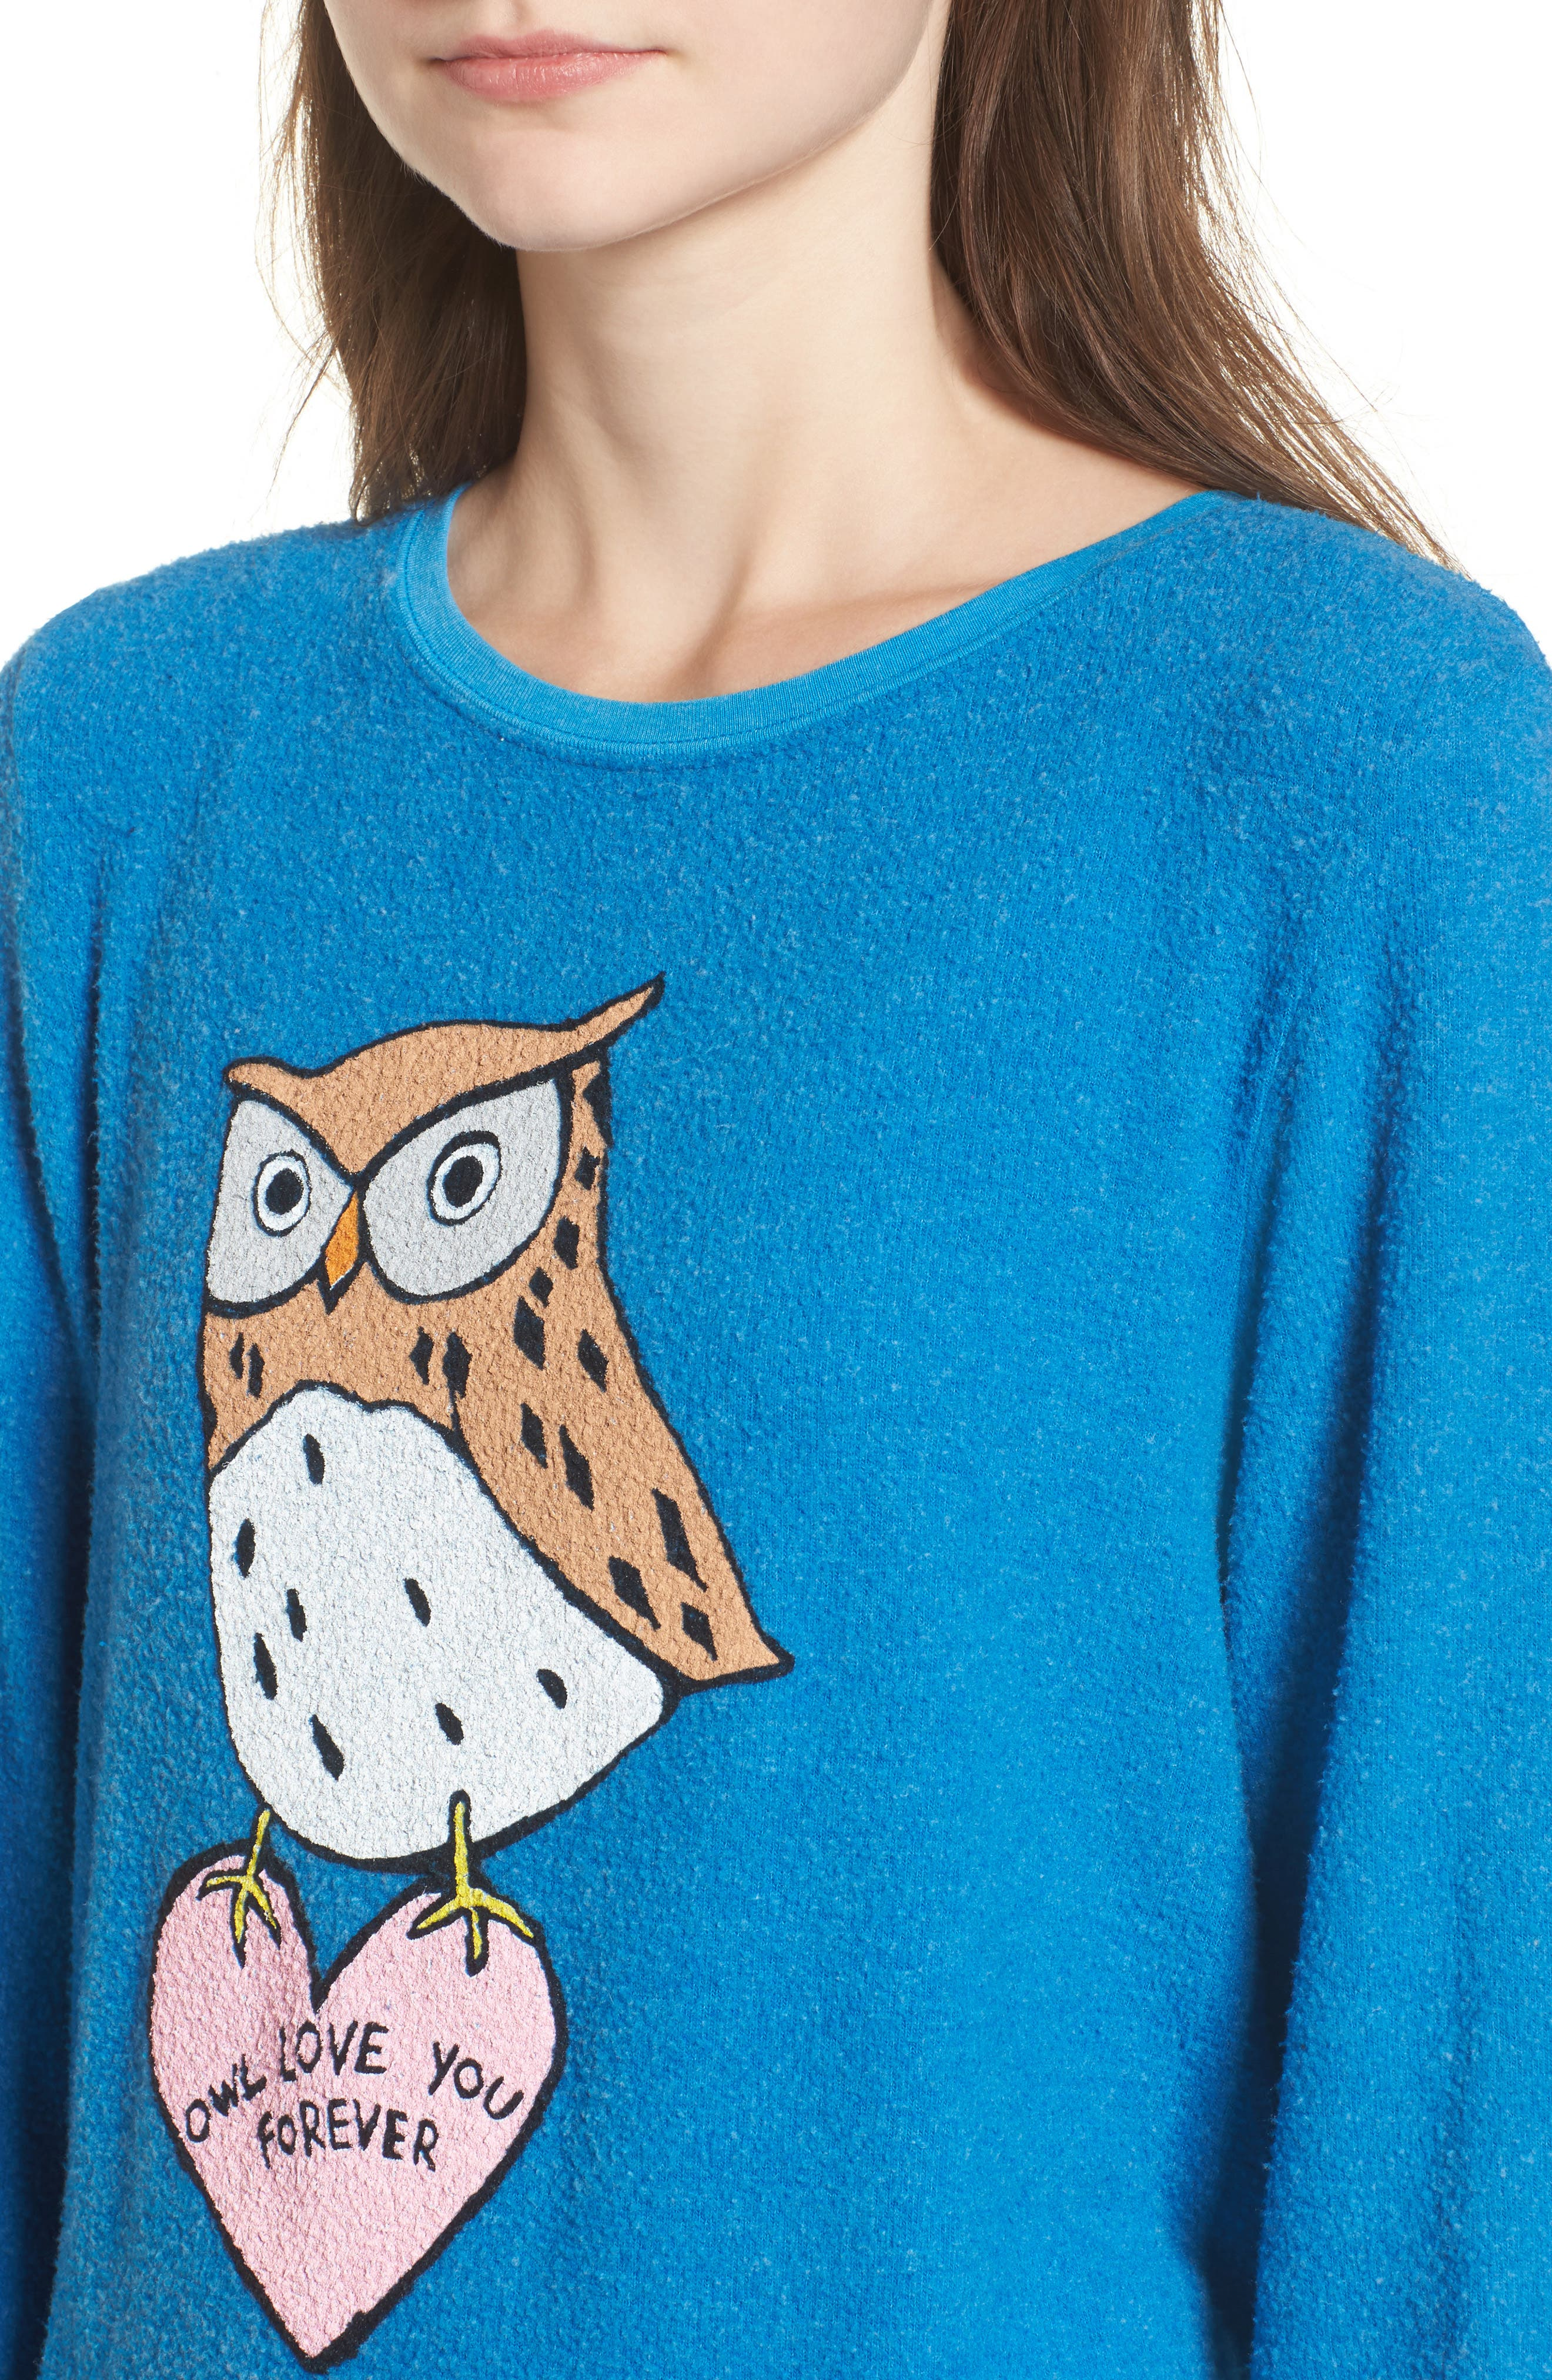 Owl Love You Forever Sweatshirt,                             Alternate thumbnail 4, color,                             401